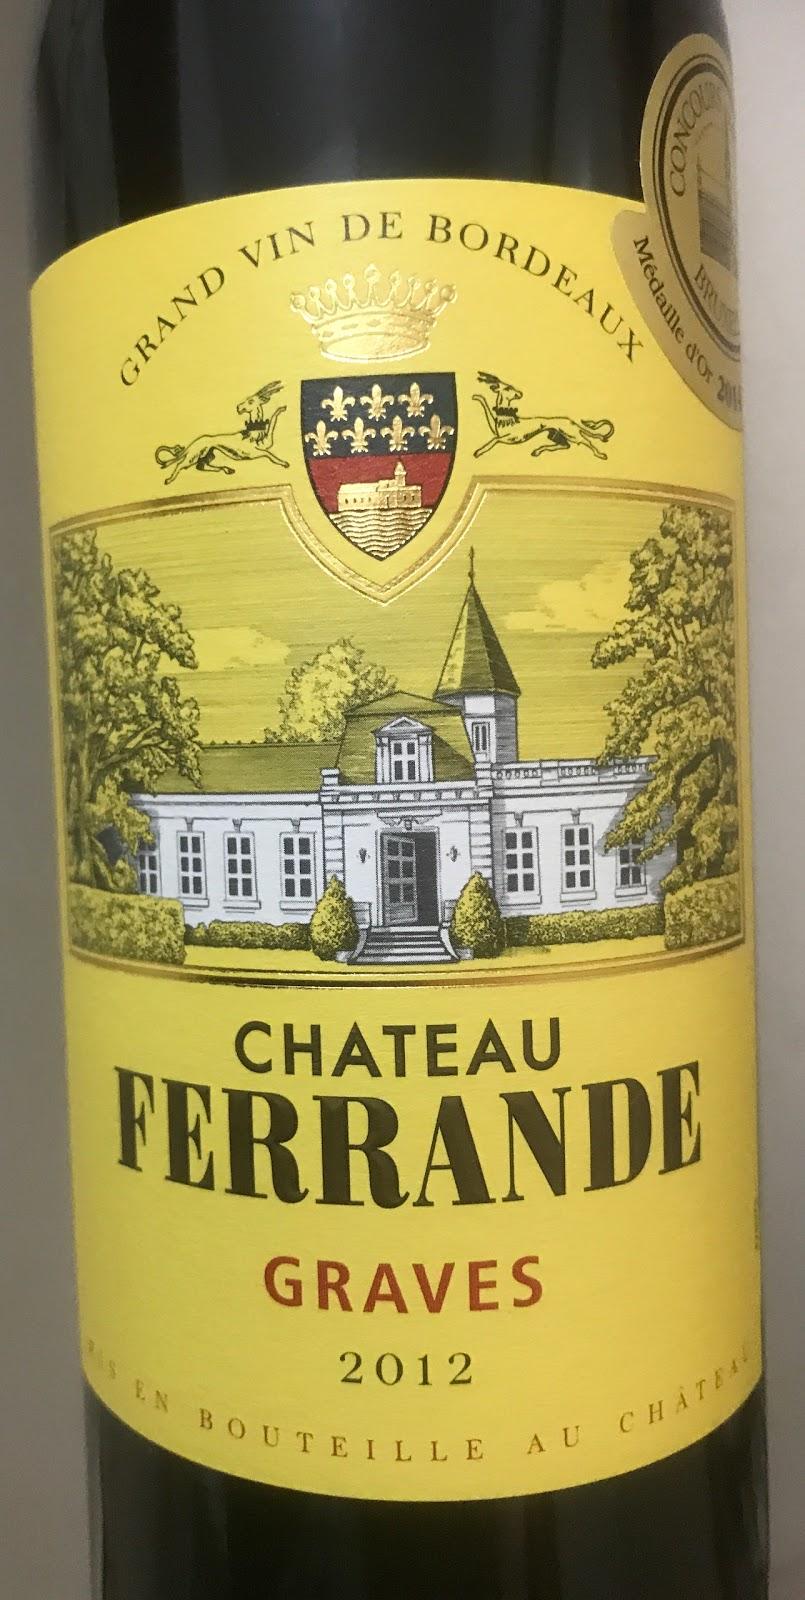 Pete 39 s wine tidbits for Chateau ferrande